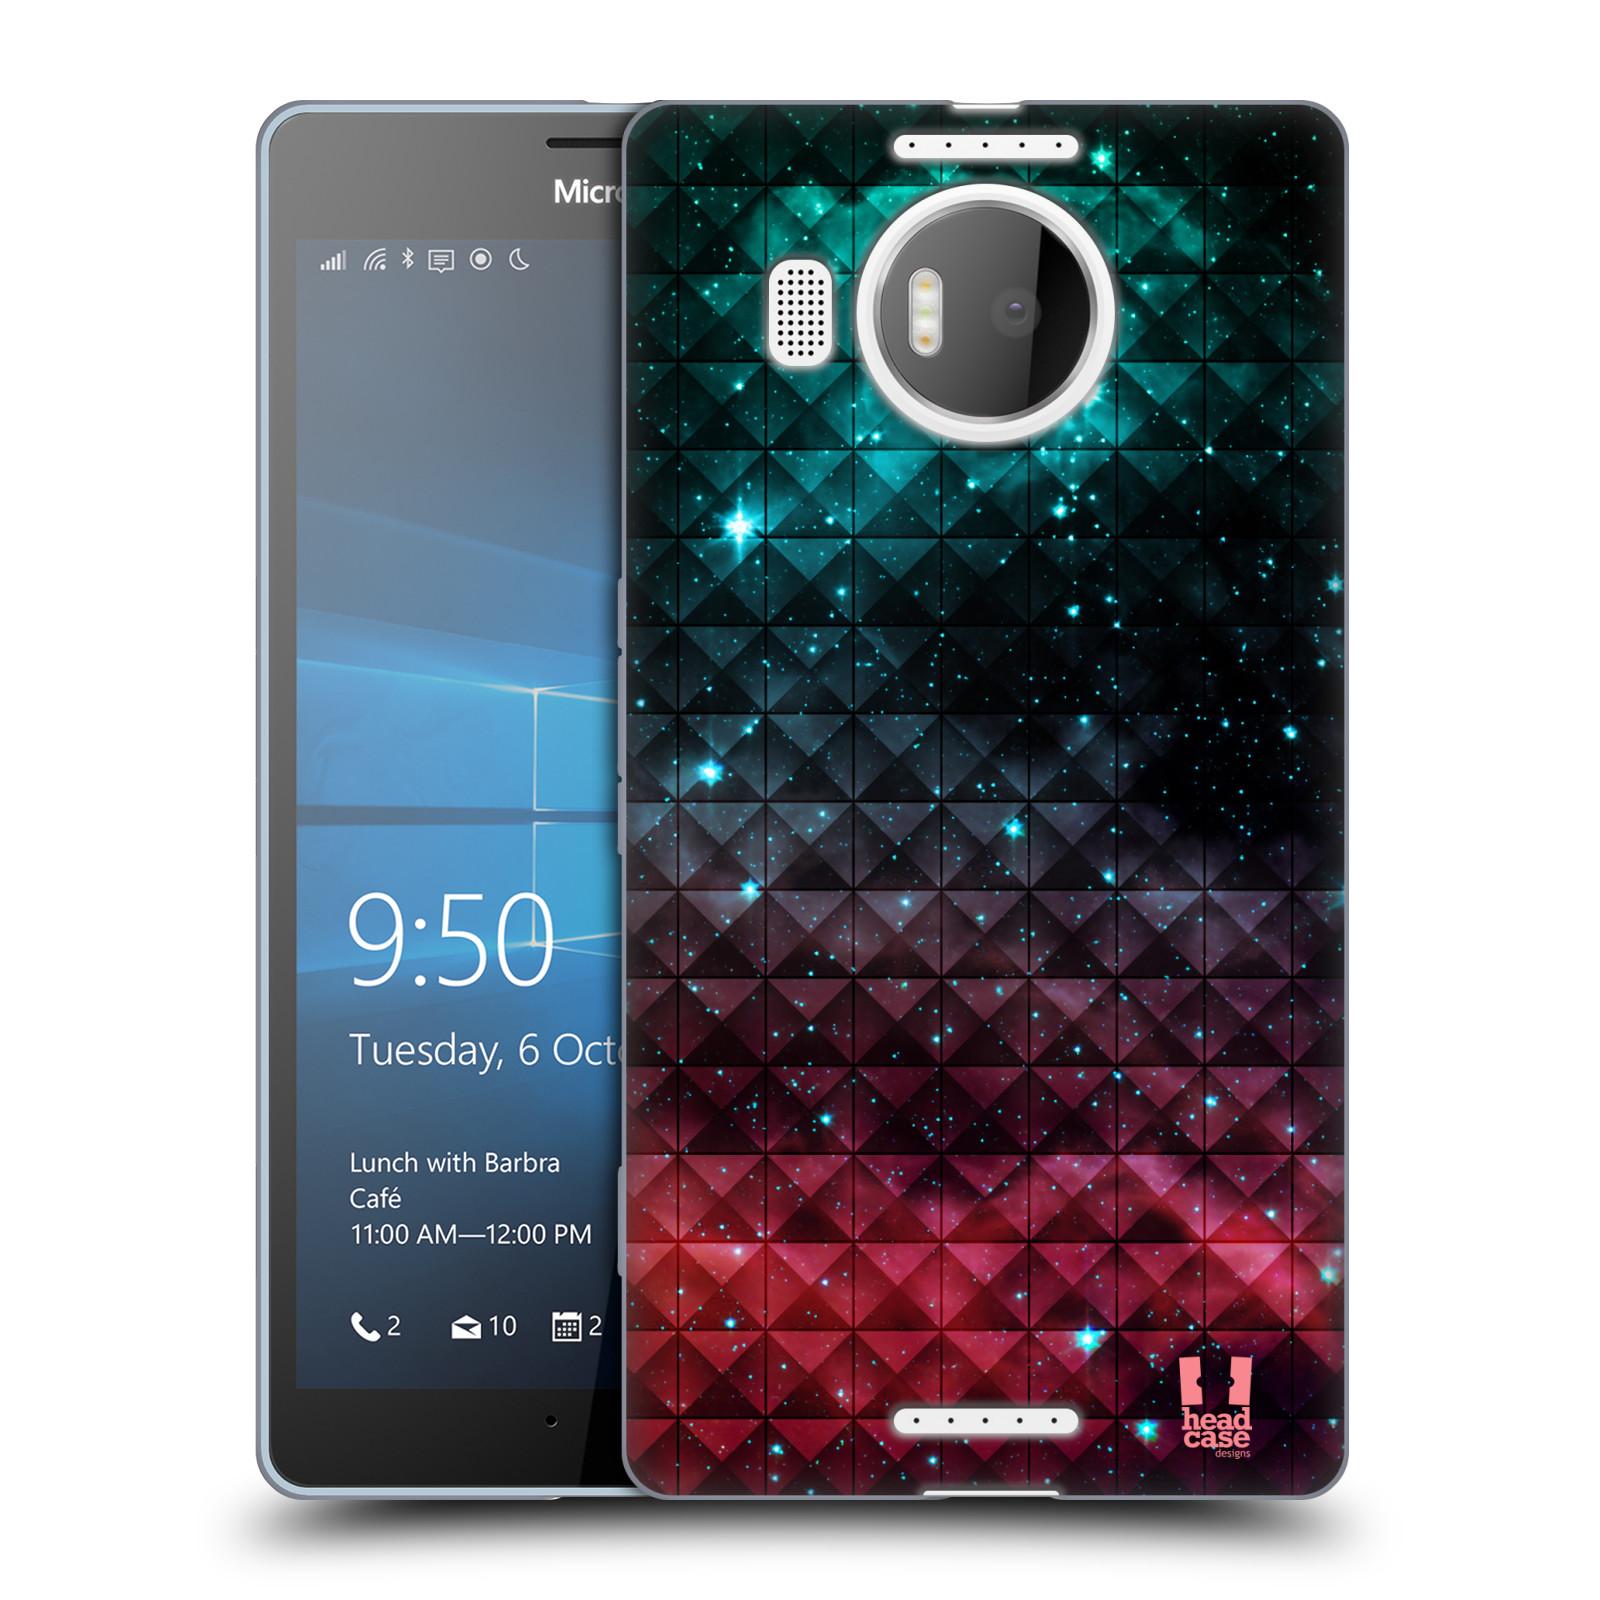 Silikonové pouzdro na mobil Microsoft Lumia 950 XL HEAD CASE OMBRE SPARKLE